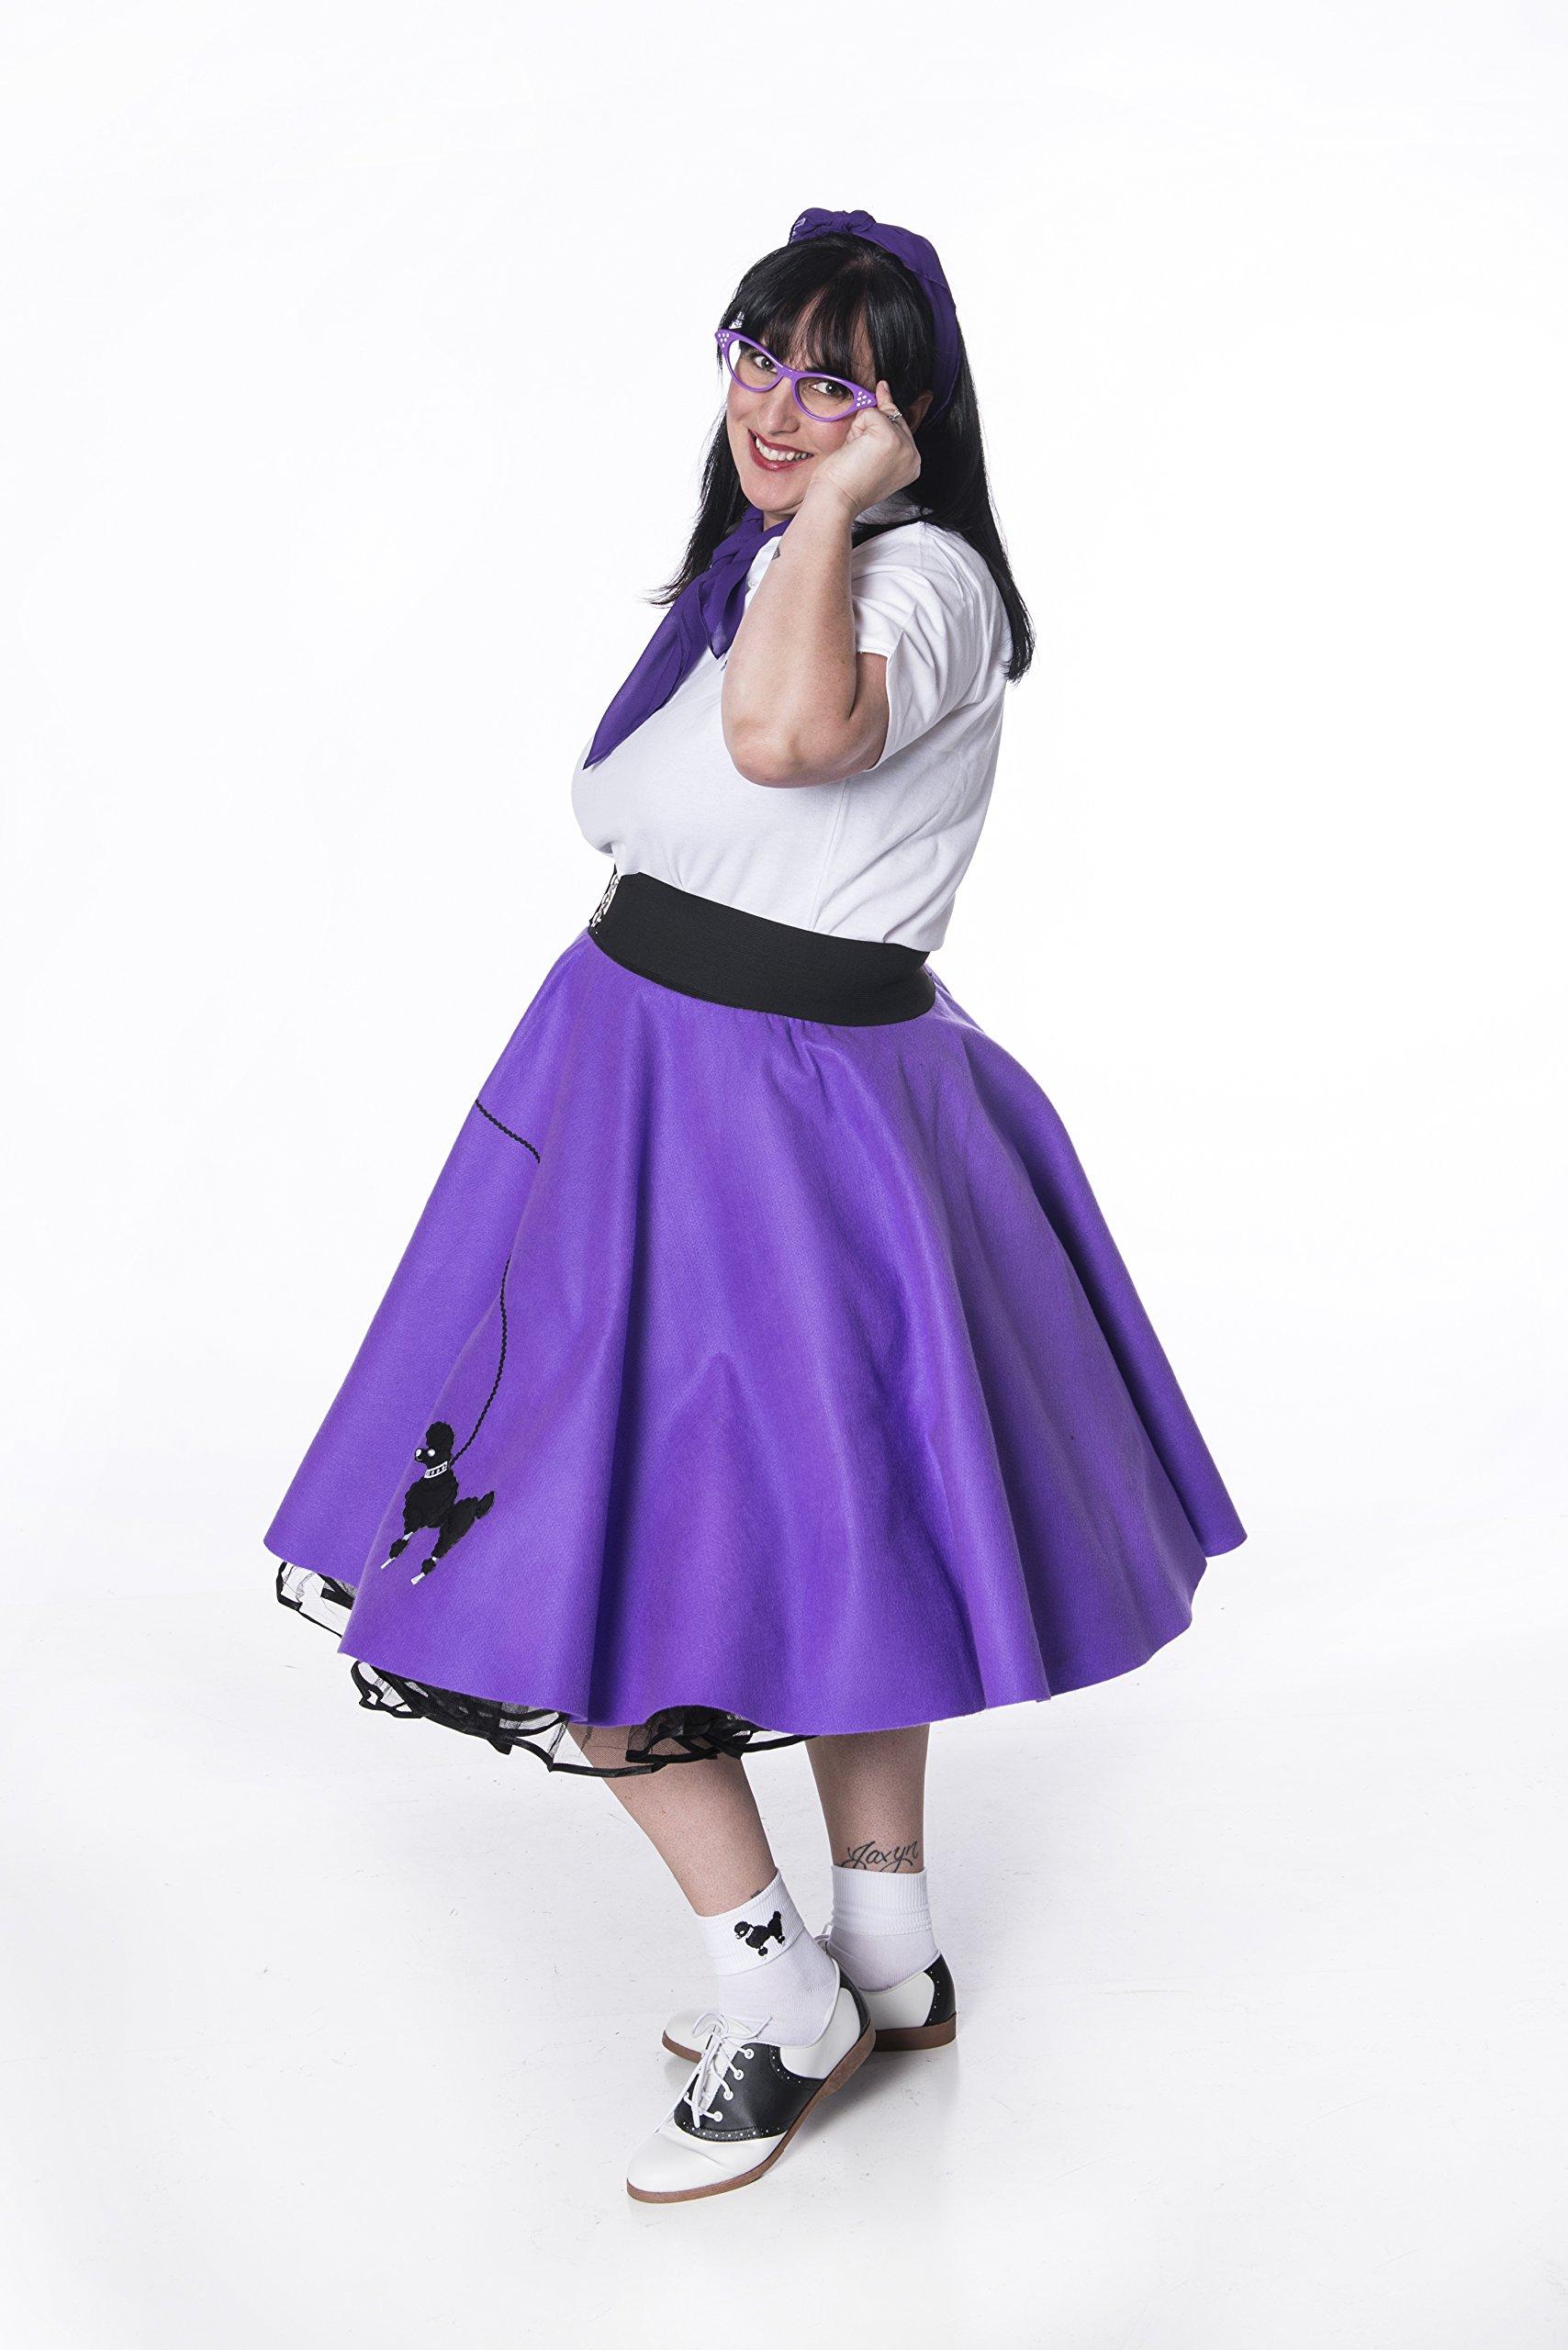 "Silver Clasp 50s Style Cinch 3"" Wide Elastic Belt for Women Junior and Plus Sizes Black M/L by Hip Hop 50s Shop (Image #5)"